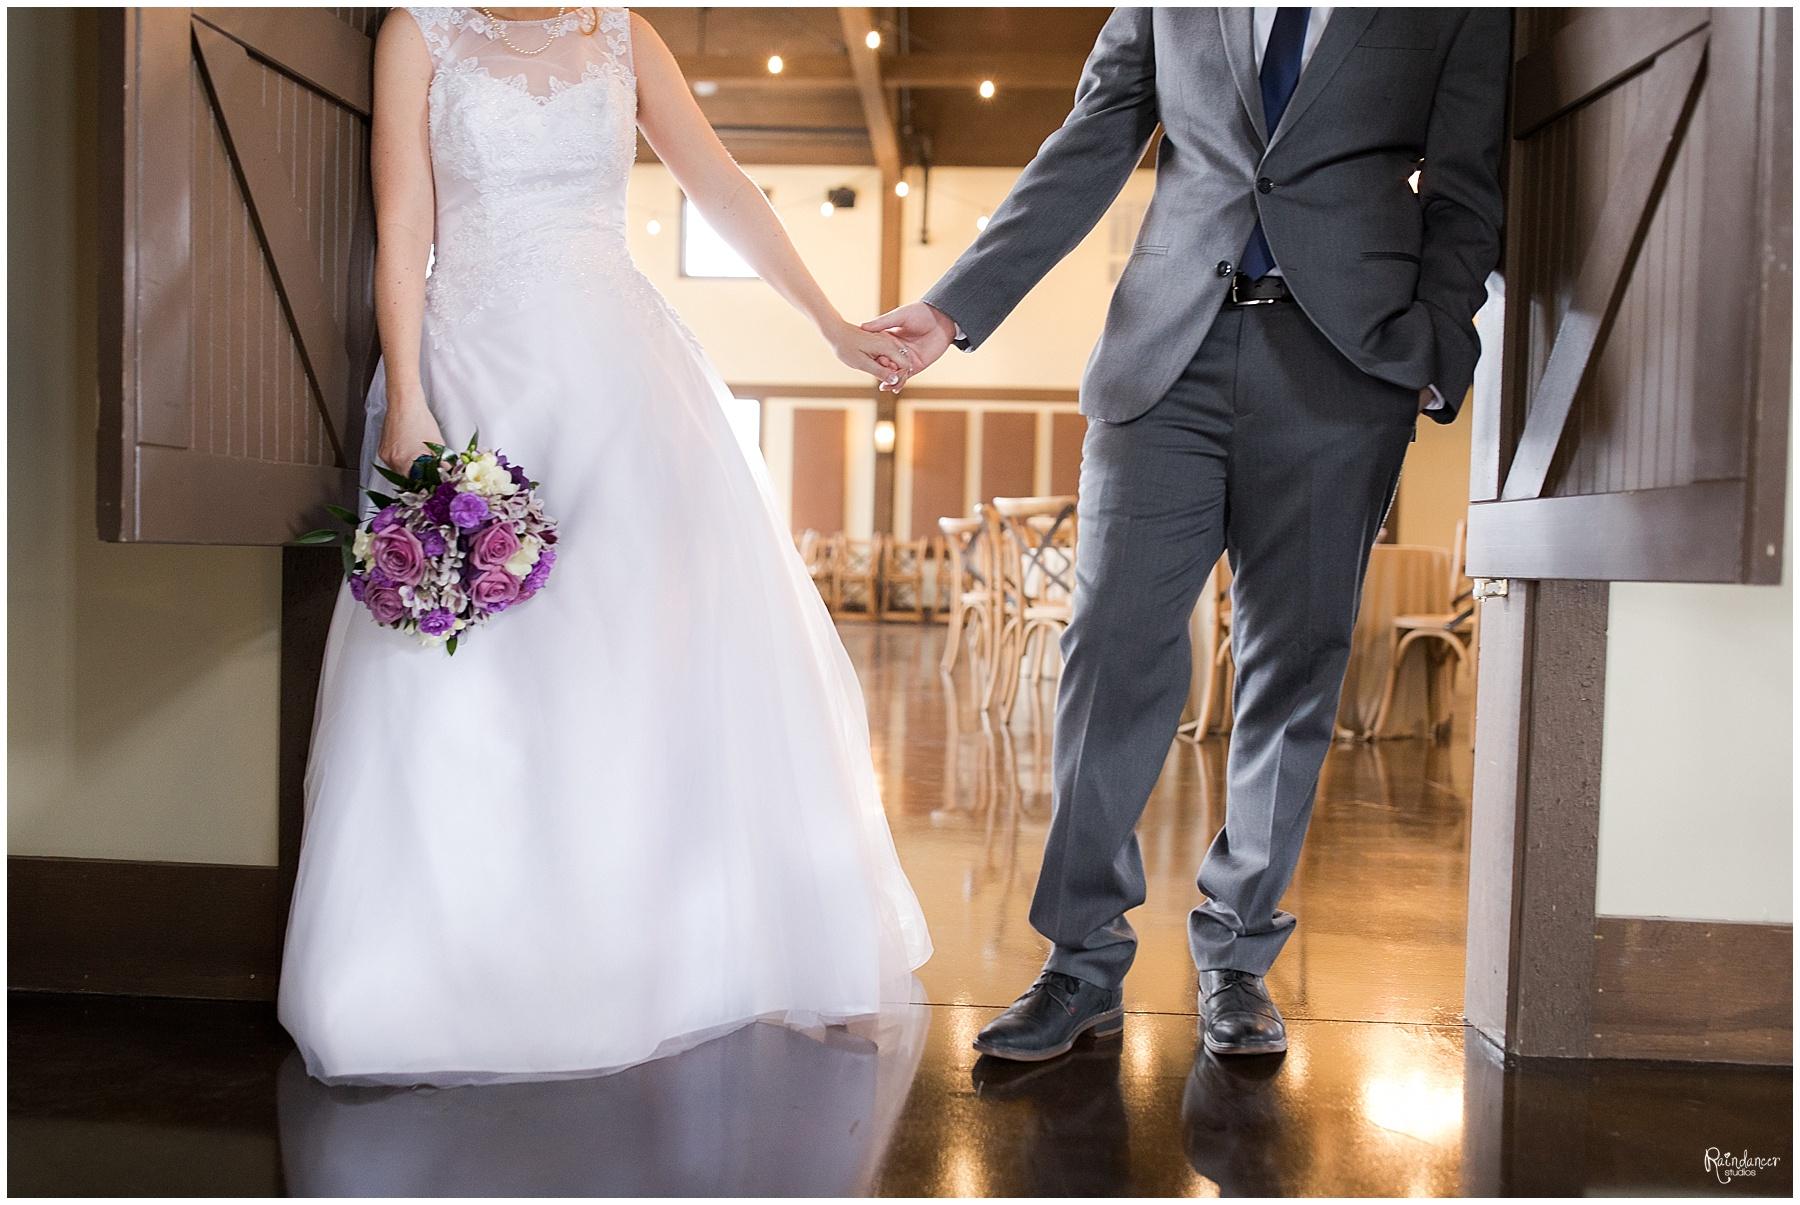 Bride and groom holding hands in a doorway by Raindancer Studios Indianapolis Wedding Photographer Jill Howell